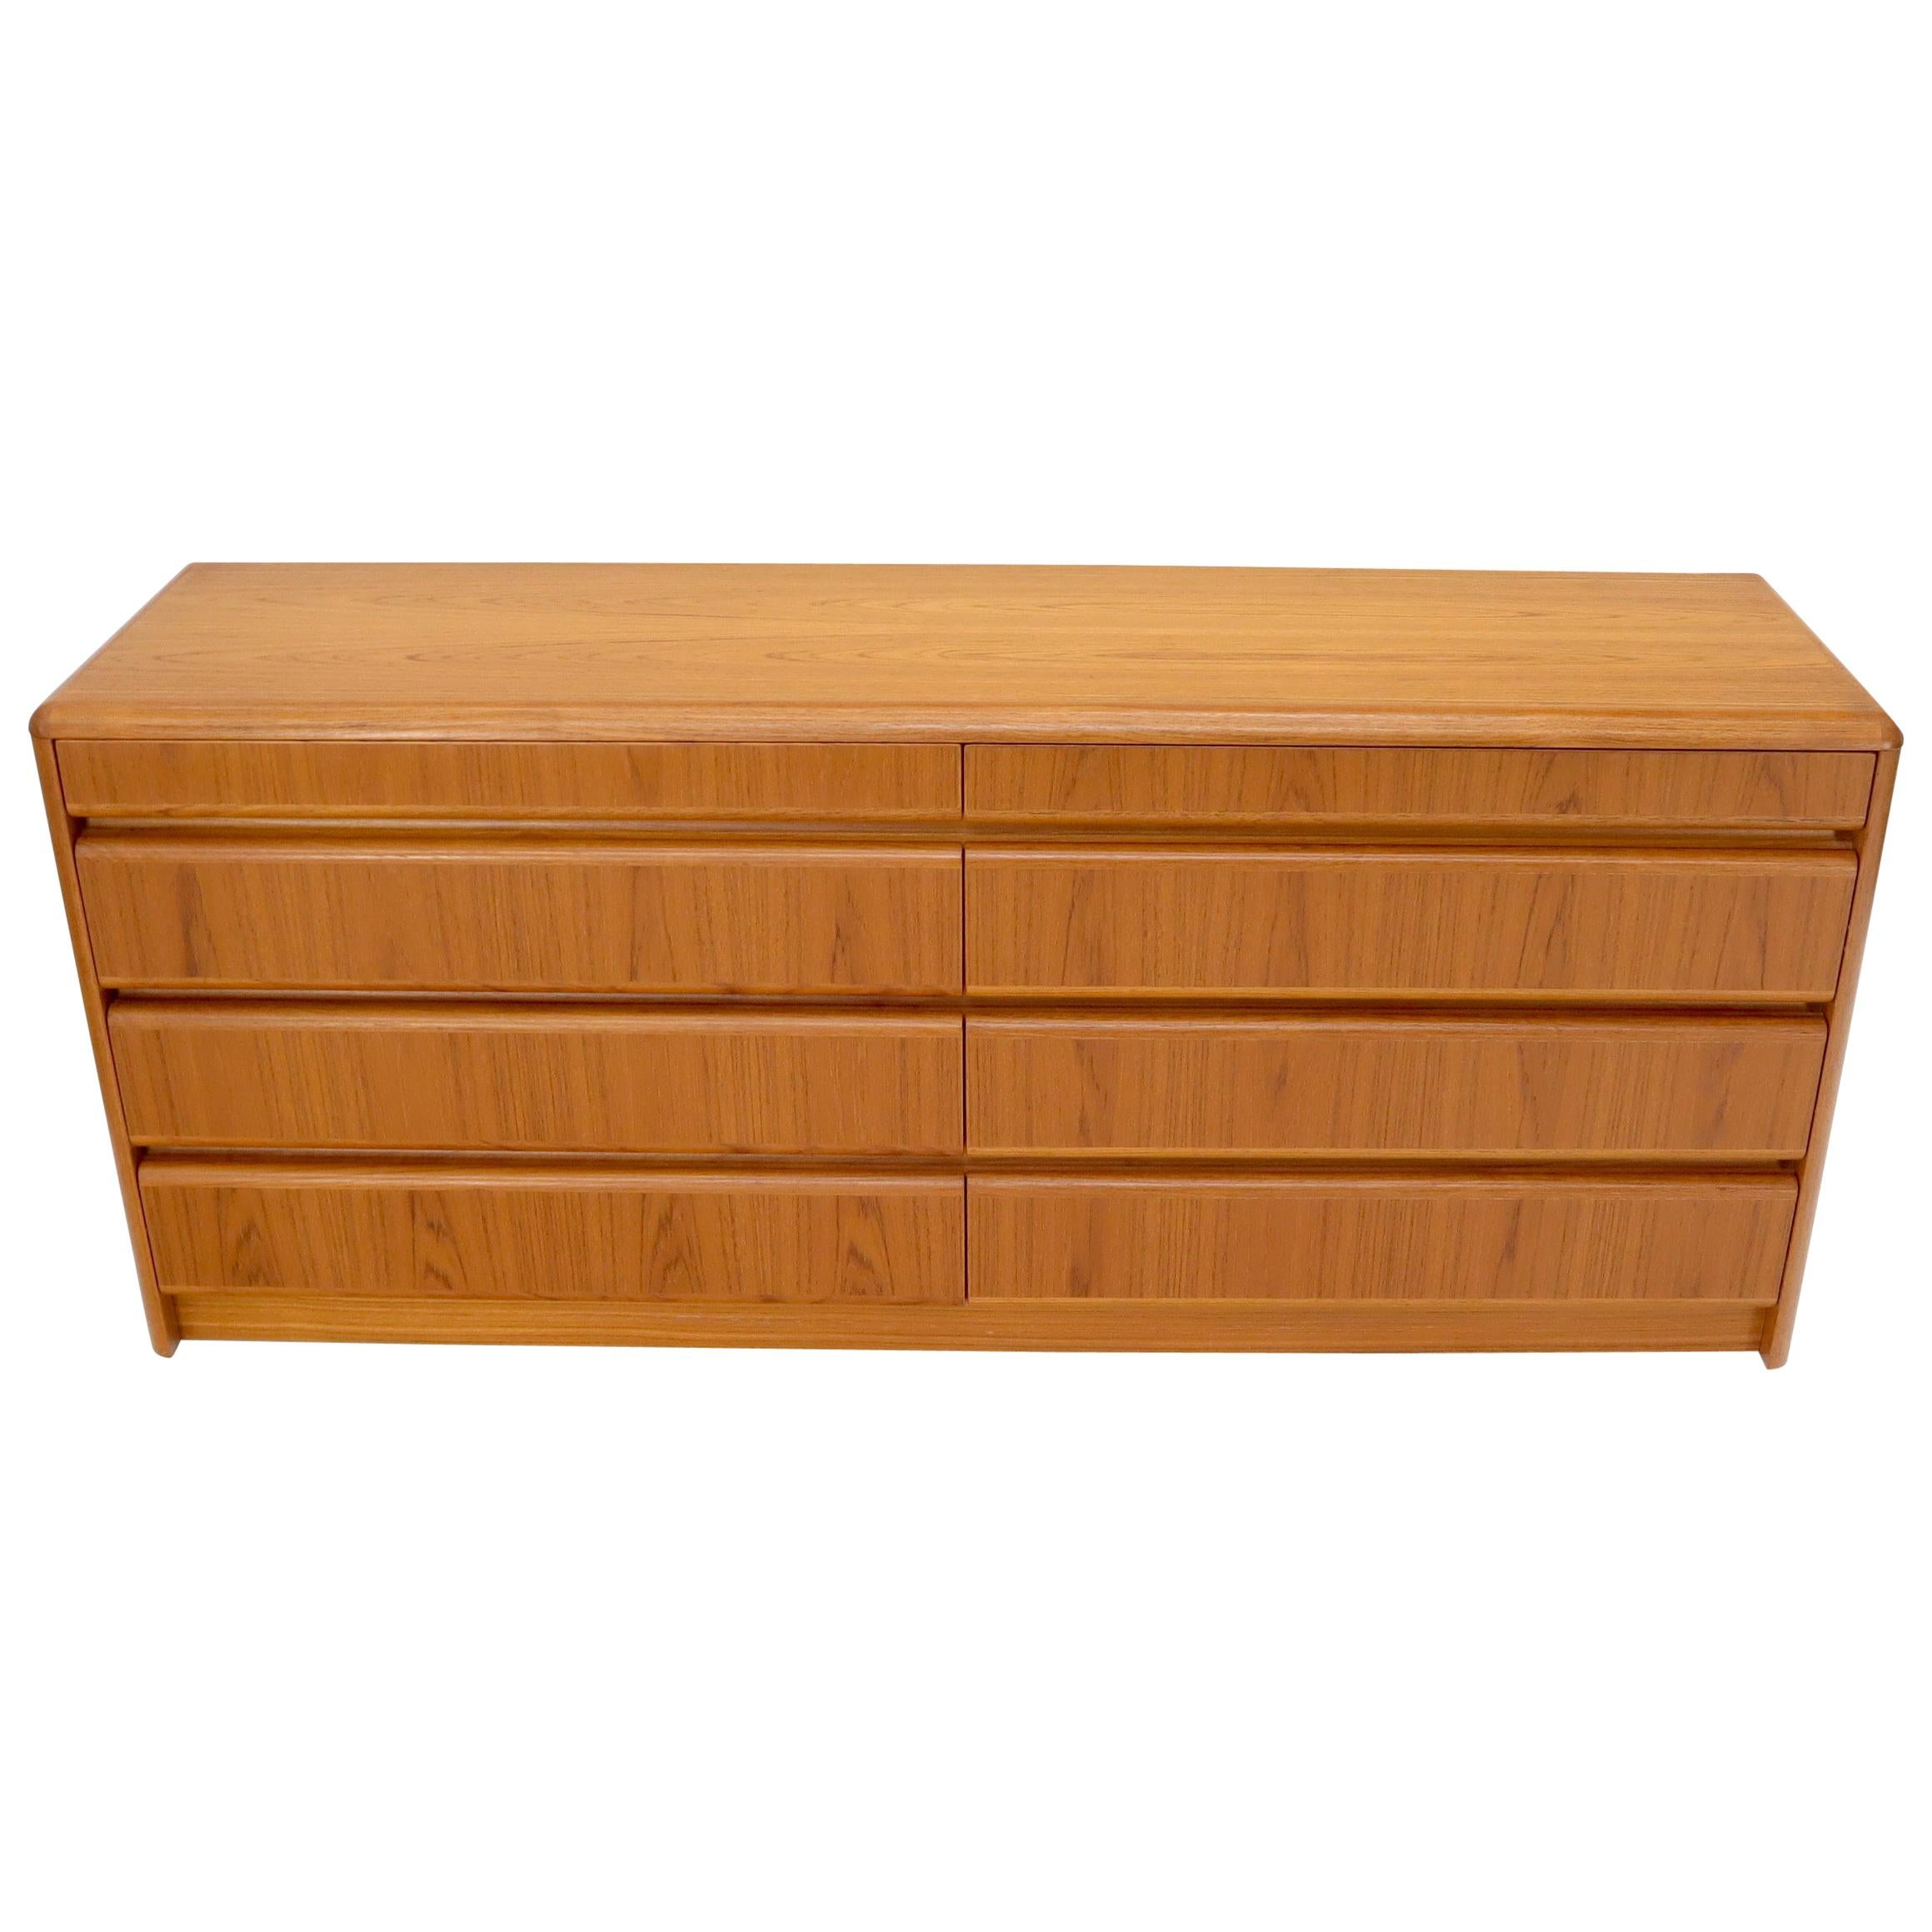 Danish Teak Mid-Century Modern 8 Drawers Dresser